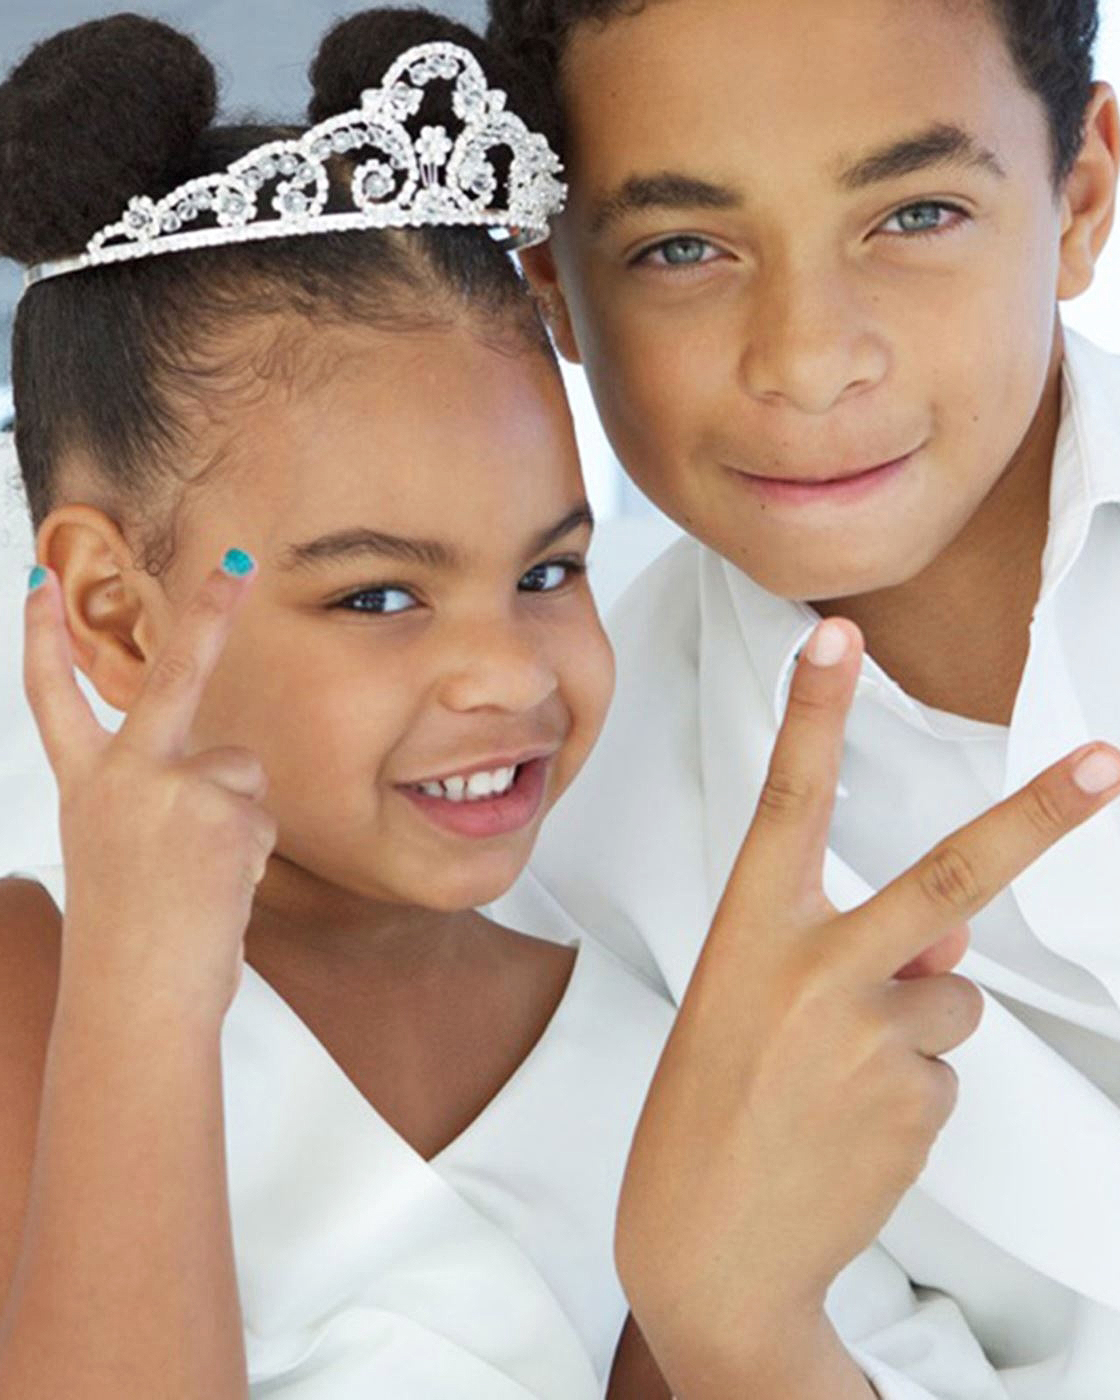 blue-ivy-carter-daniel-julez-celebrity-kids-weddings-0716.jpg